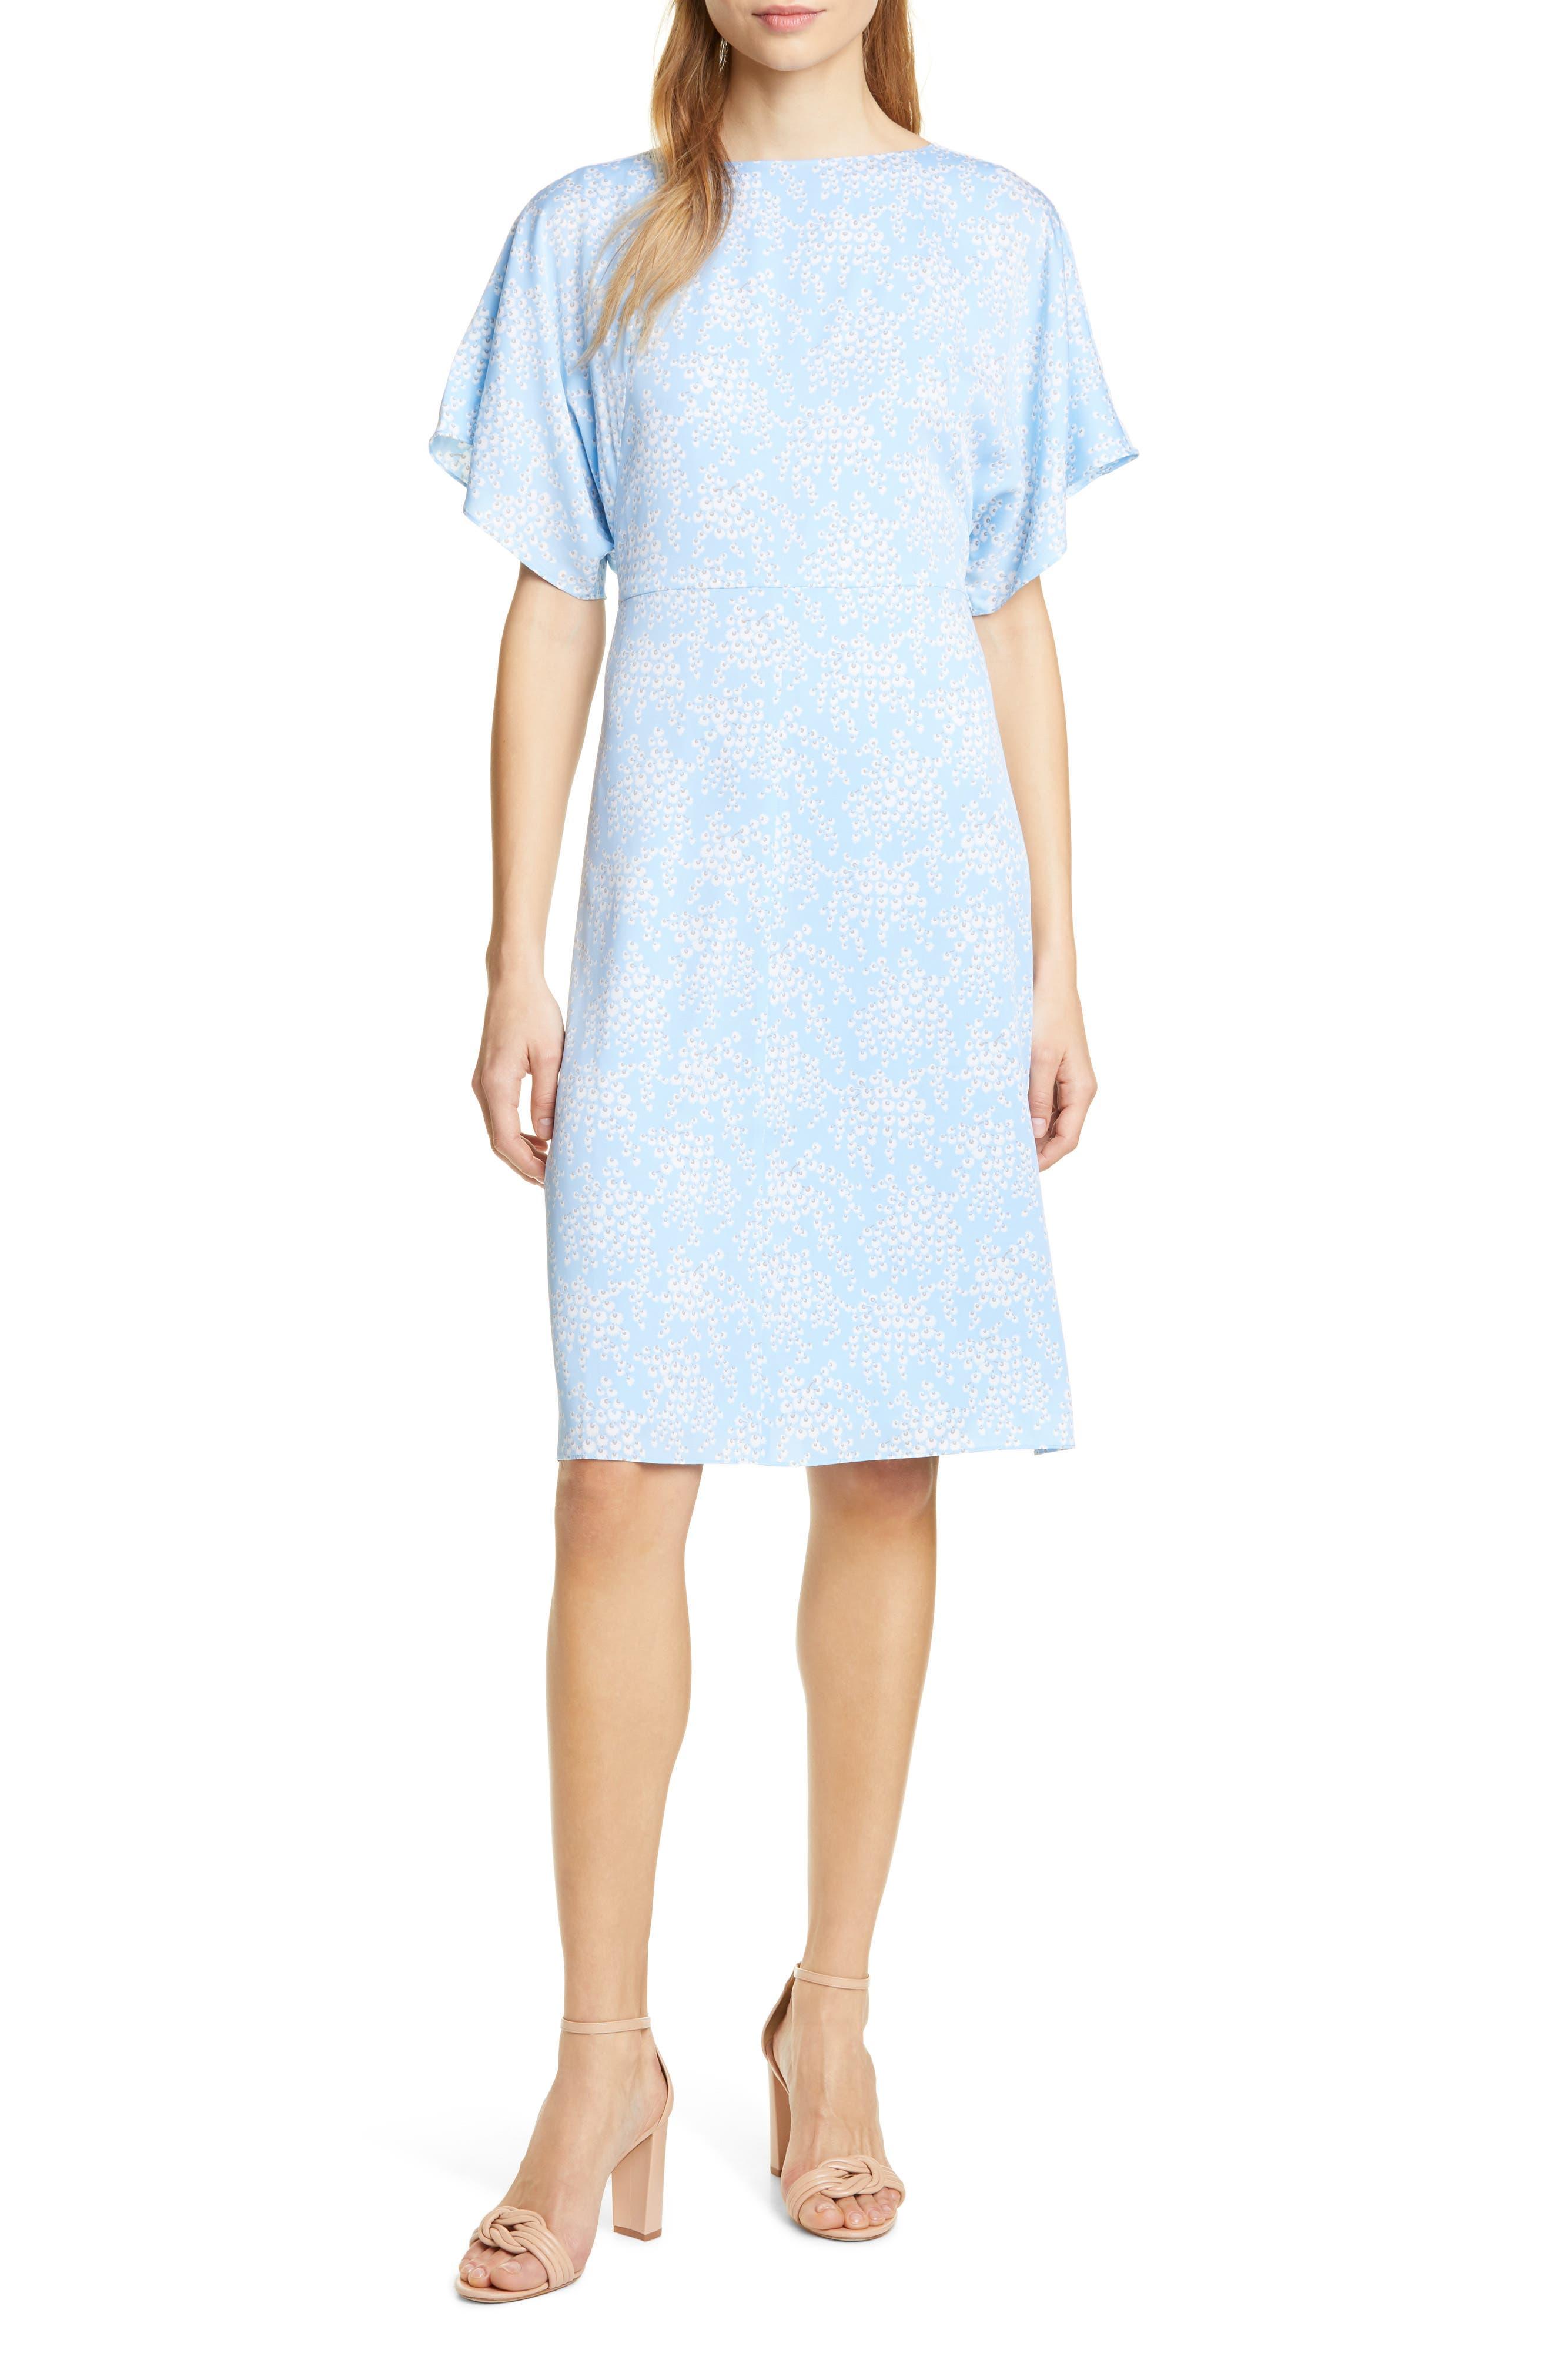 LEWIT, Kimono Sleeve Stretch Silk Dress, Main thumbnail 1, color, BLUE SIDDAL FLORAL